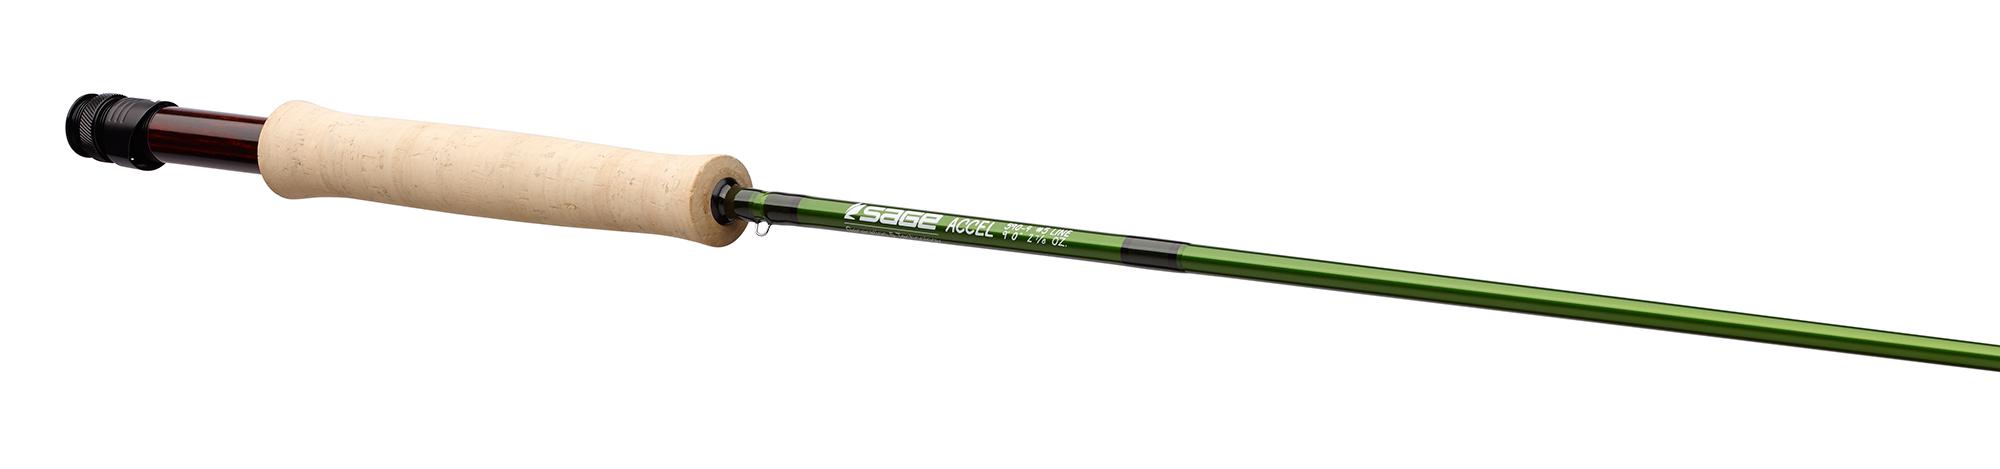 Sage ACCEL Fly Rod 2000